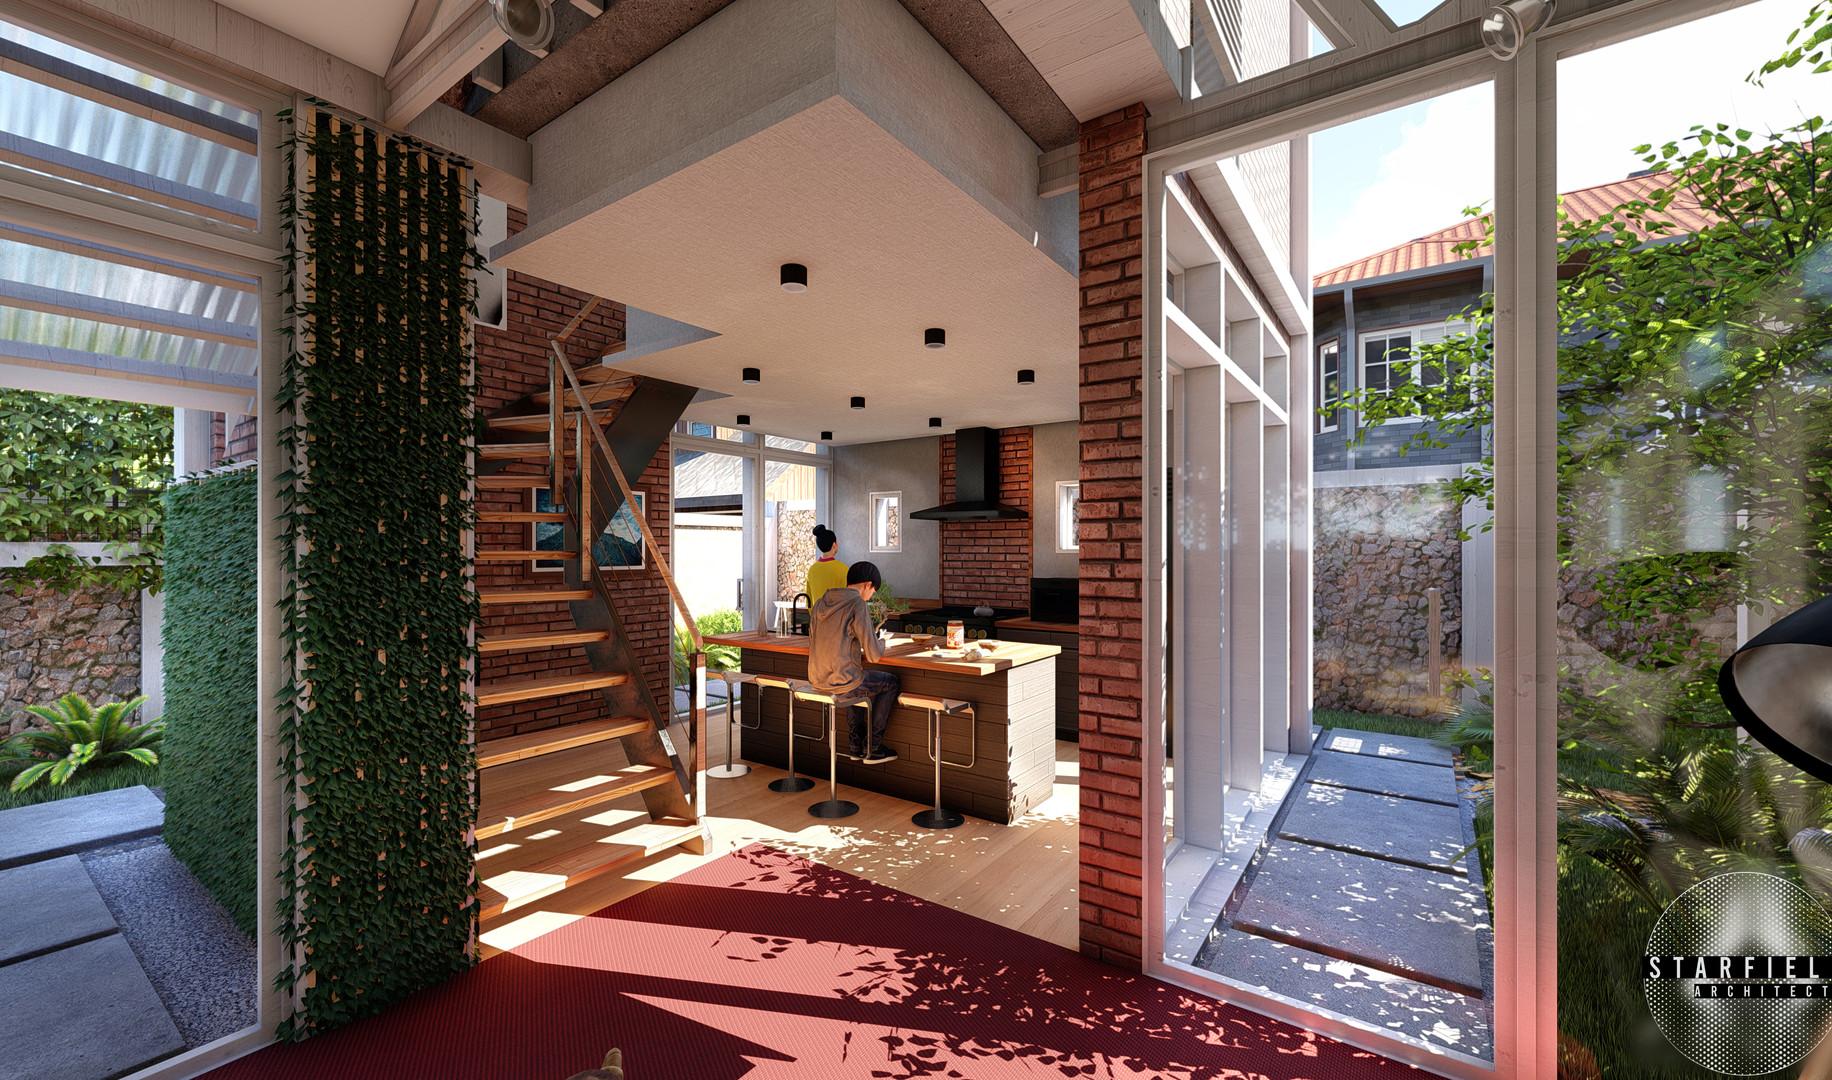 Arise_Architects_House Meyer_Render 4.jp